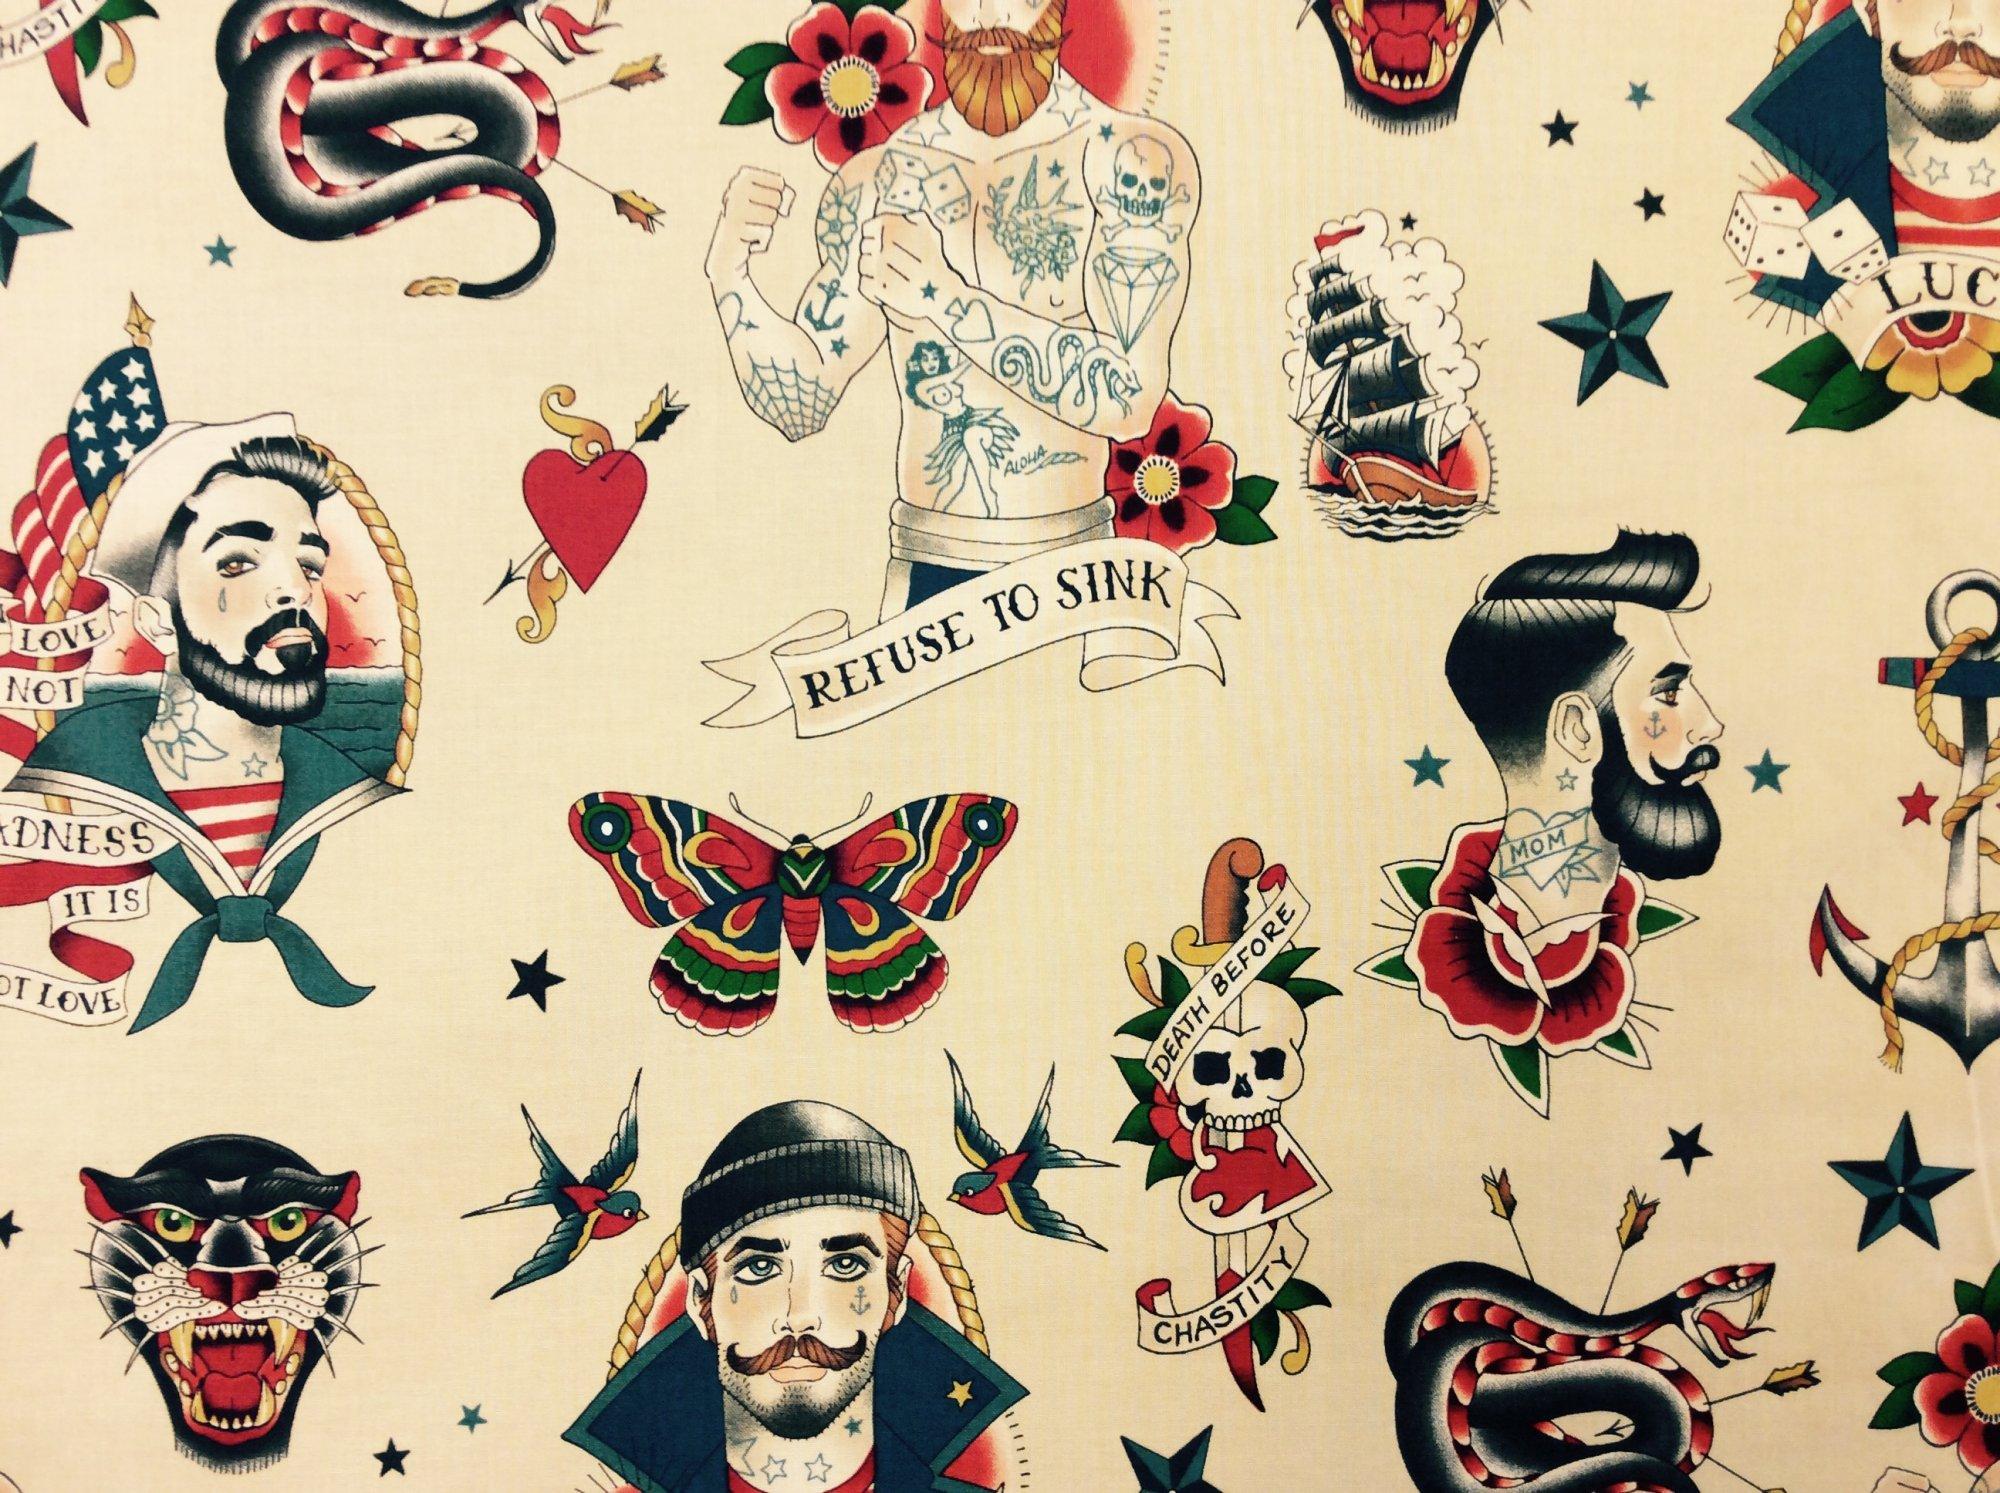 Tattoo Sailor Pin Up Men Retro Barber Hipster Cotton Quilt Fabric AH306